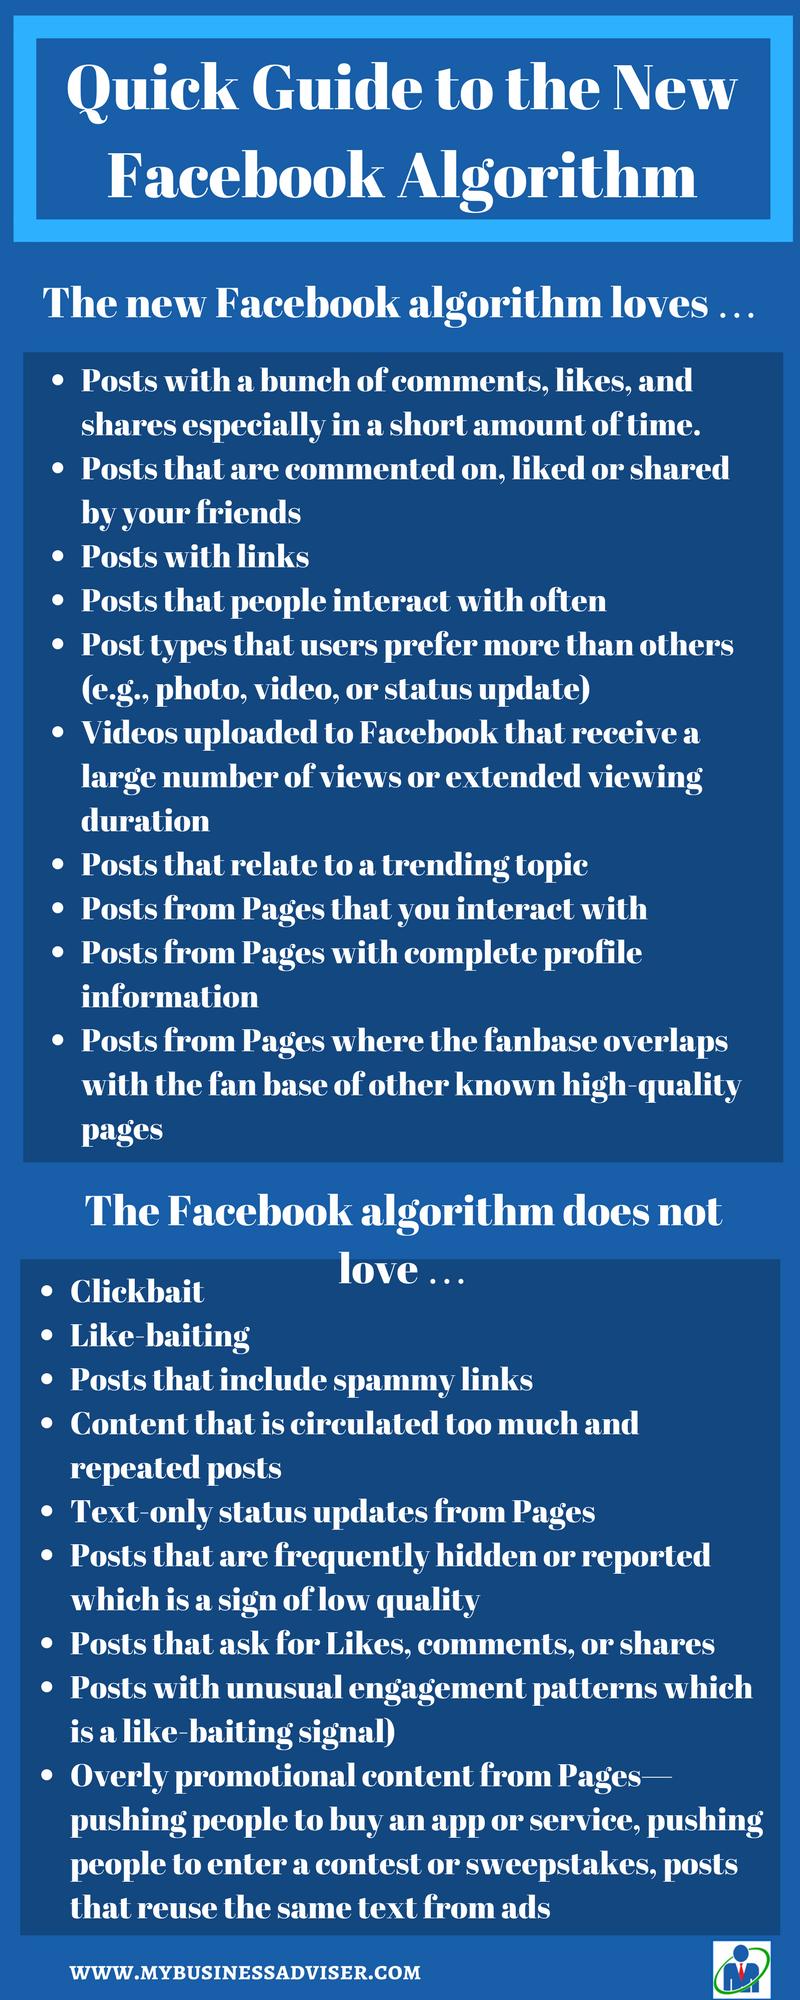 Quick Guide to Facebook Algorithm